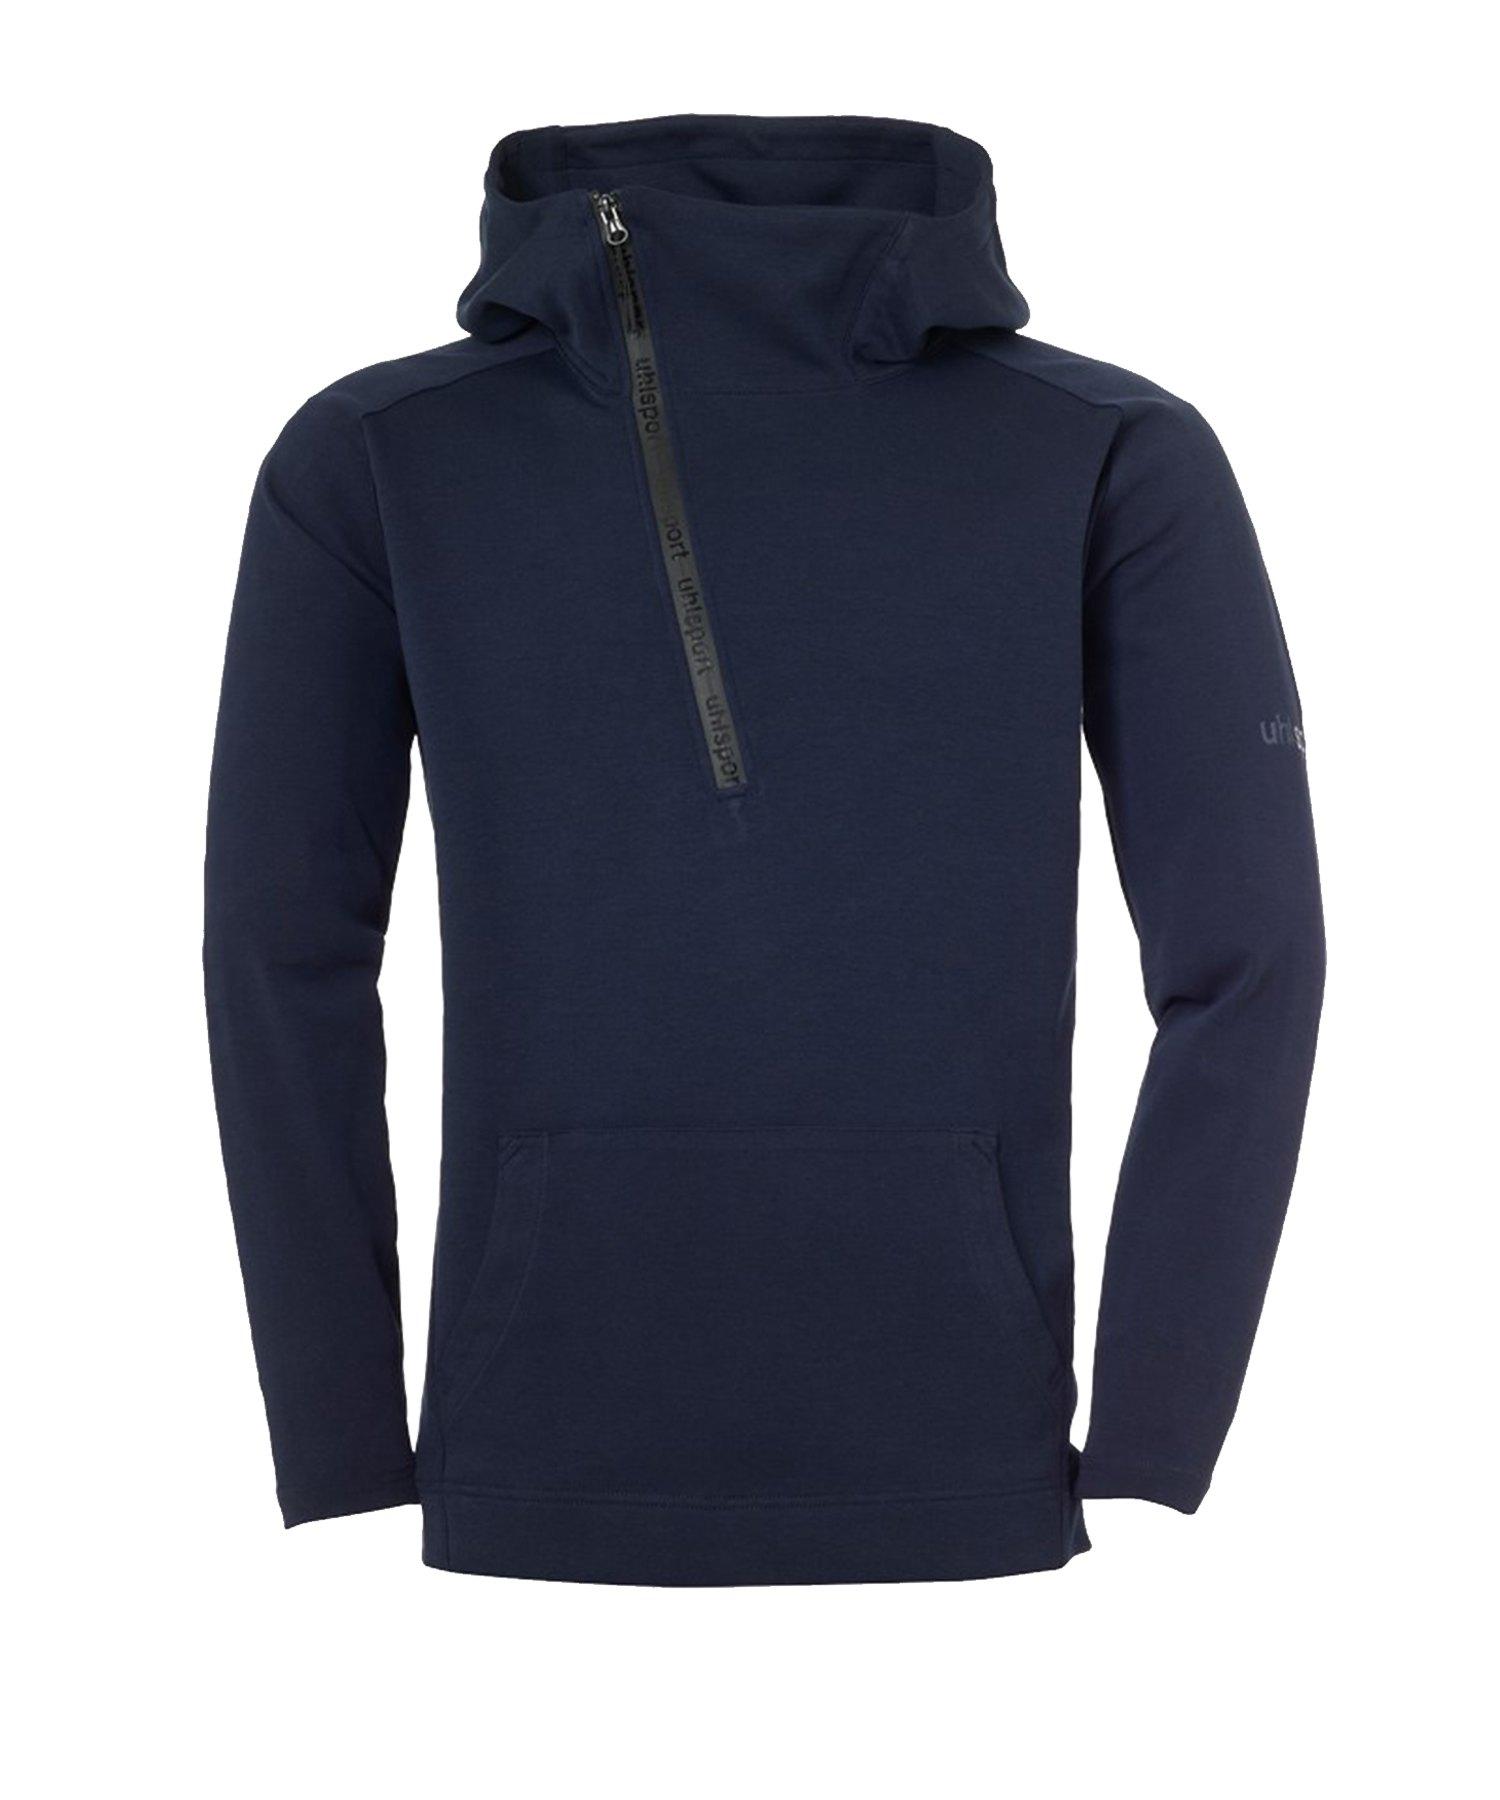 Uhlsport Essential Pro Ziptop Blau F12 - Blau